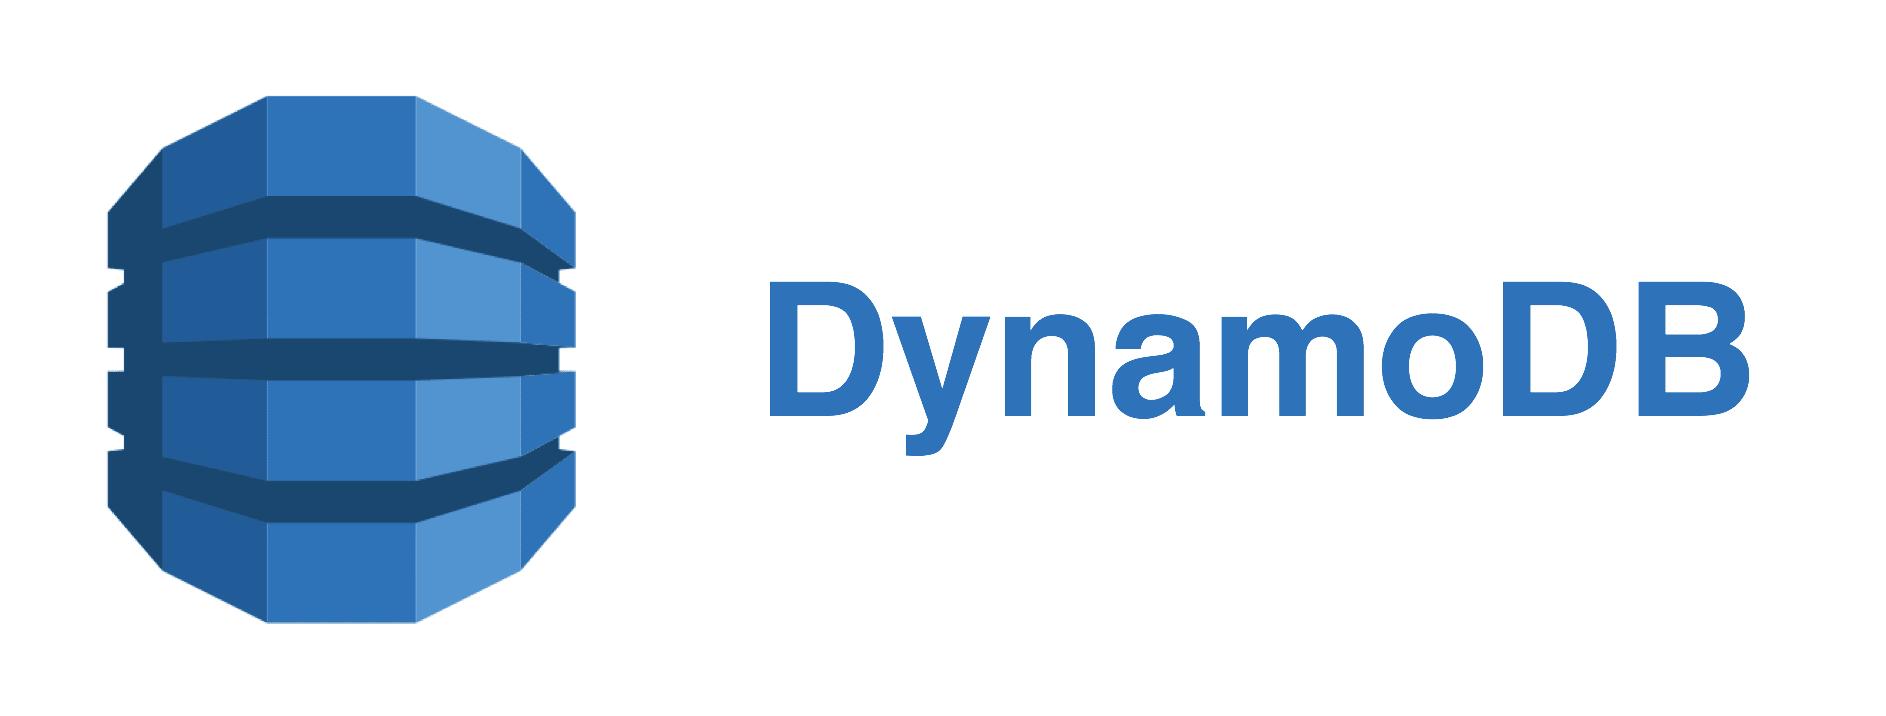 AWS DynamoDB logo